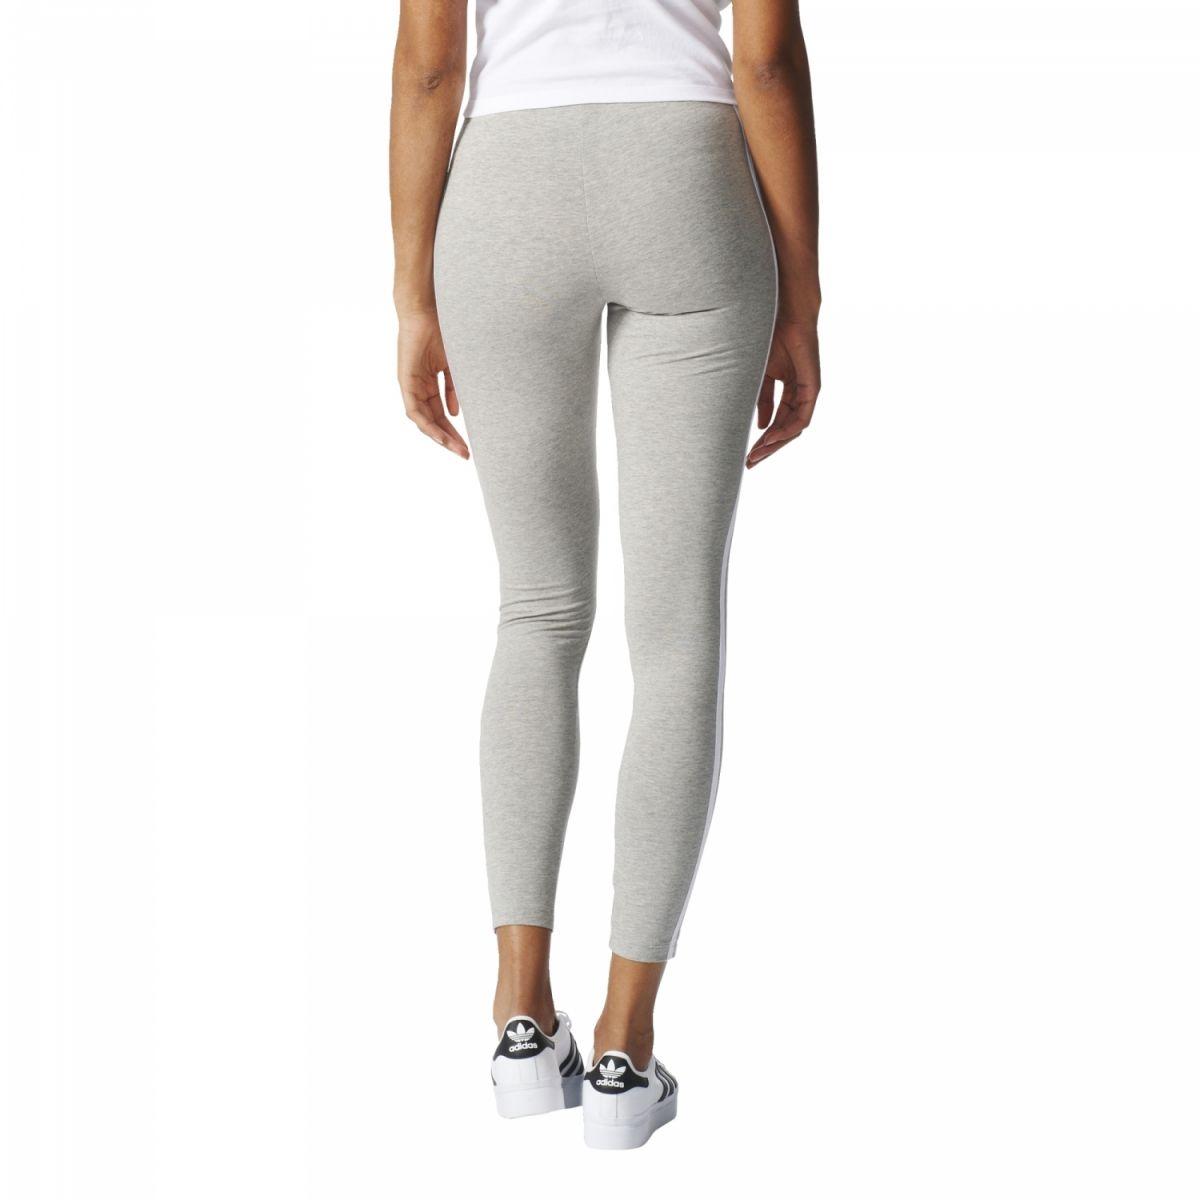 sport klingenmaier adidas originals 3 streifen leggings. Black Bedroom Furniture Sets. Home Design Ideas